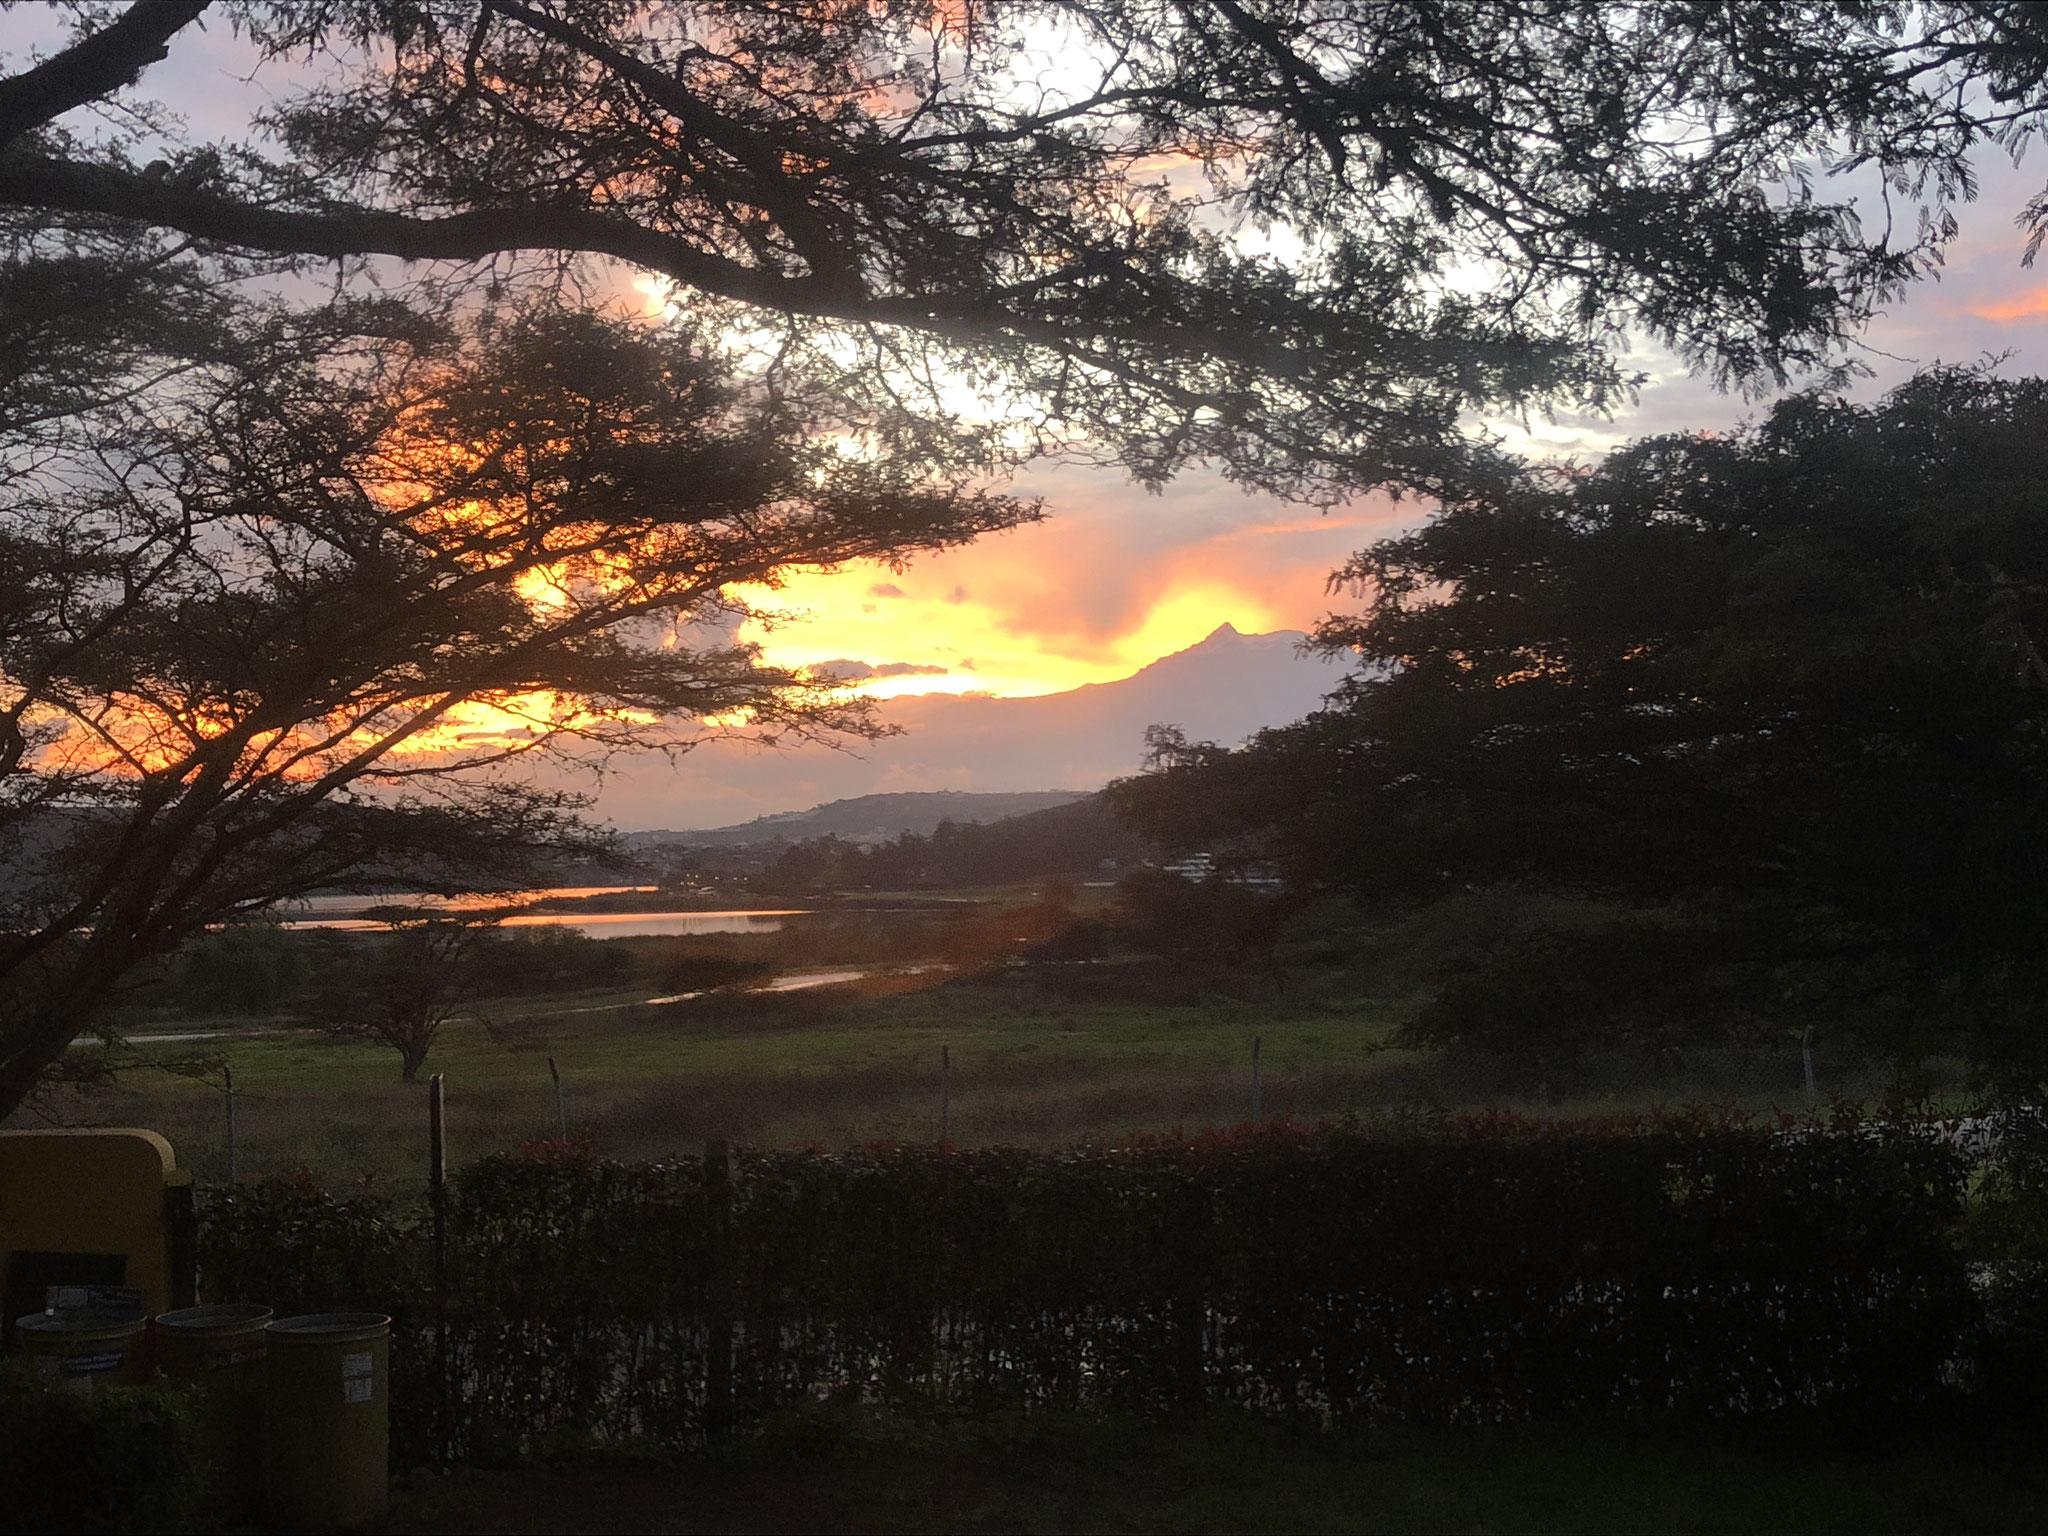 Sonnenuntergang in Ibarra